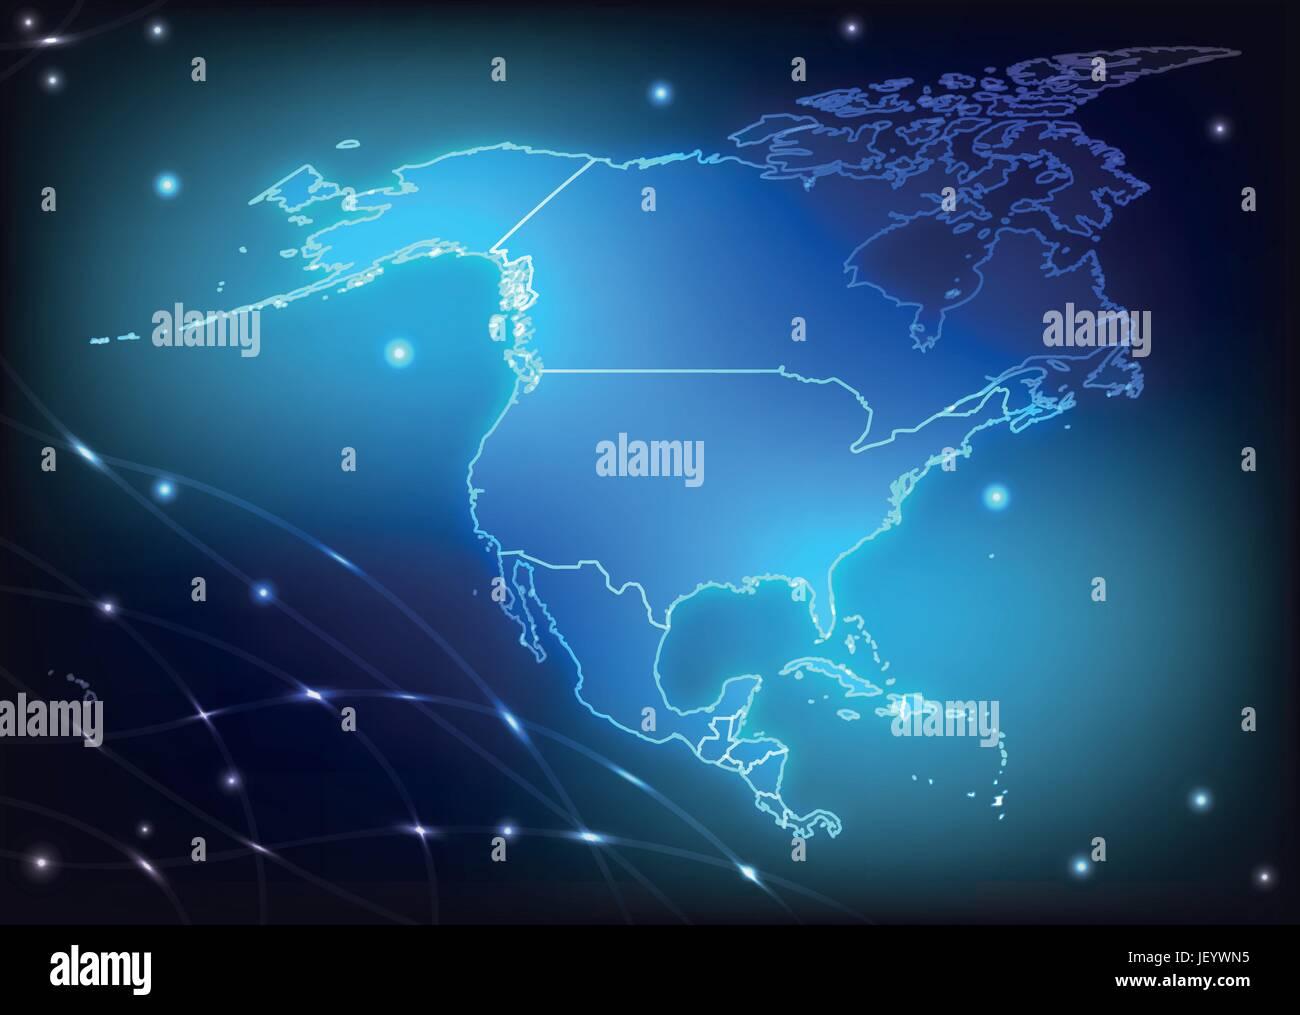 Nordamerikakarte Stockfotos & Nordamerikakarte Bilder - Alamy